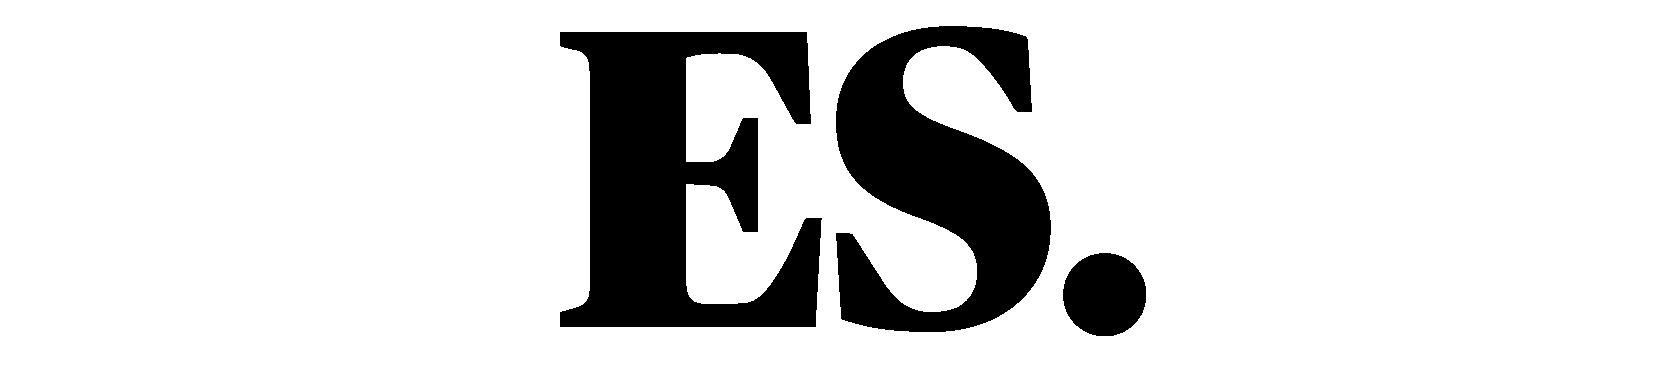 Press logos-08 copy_2.png